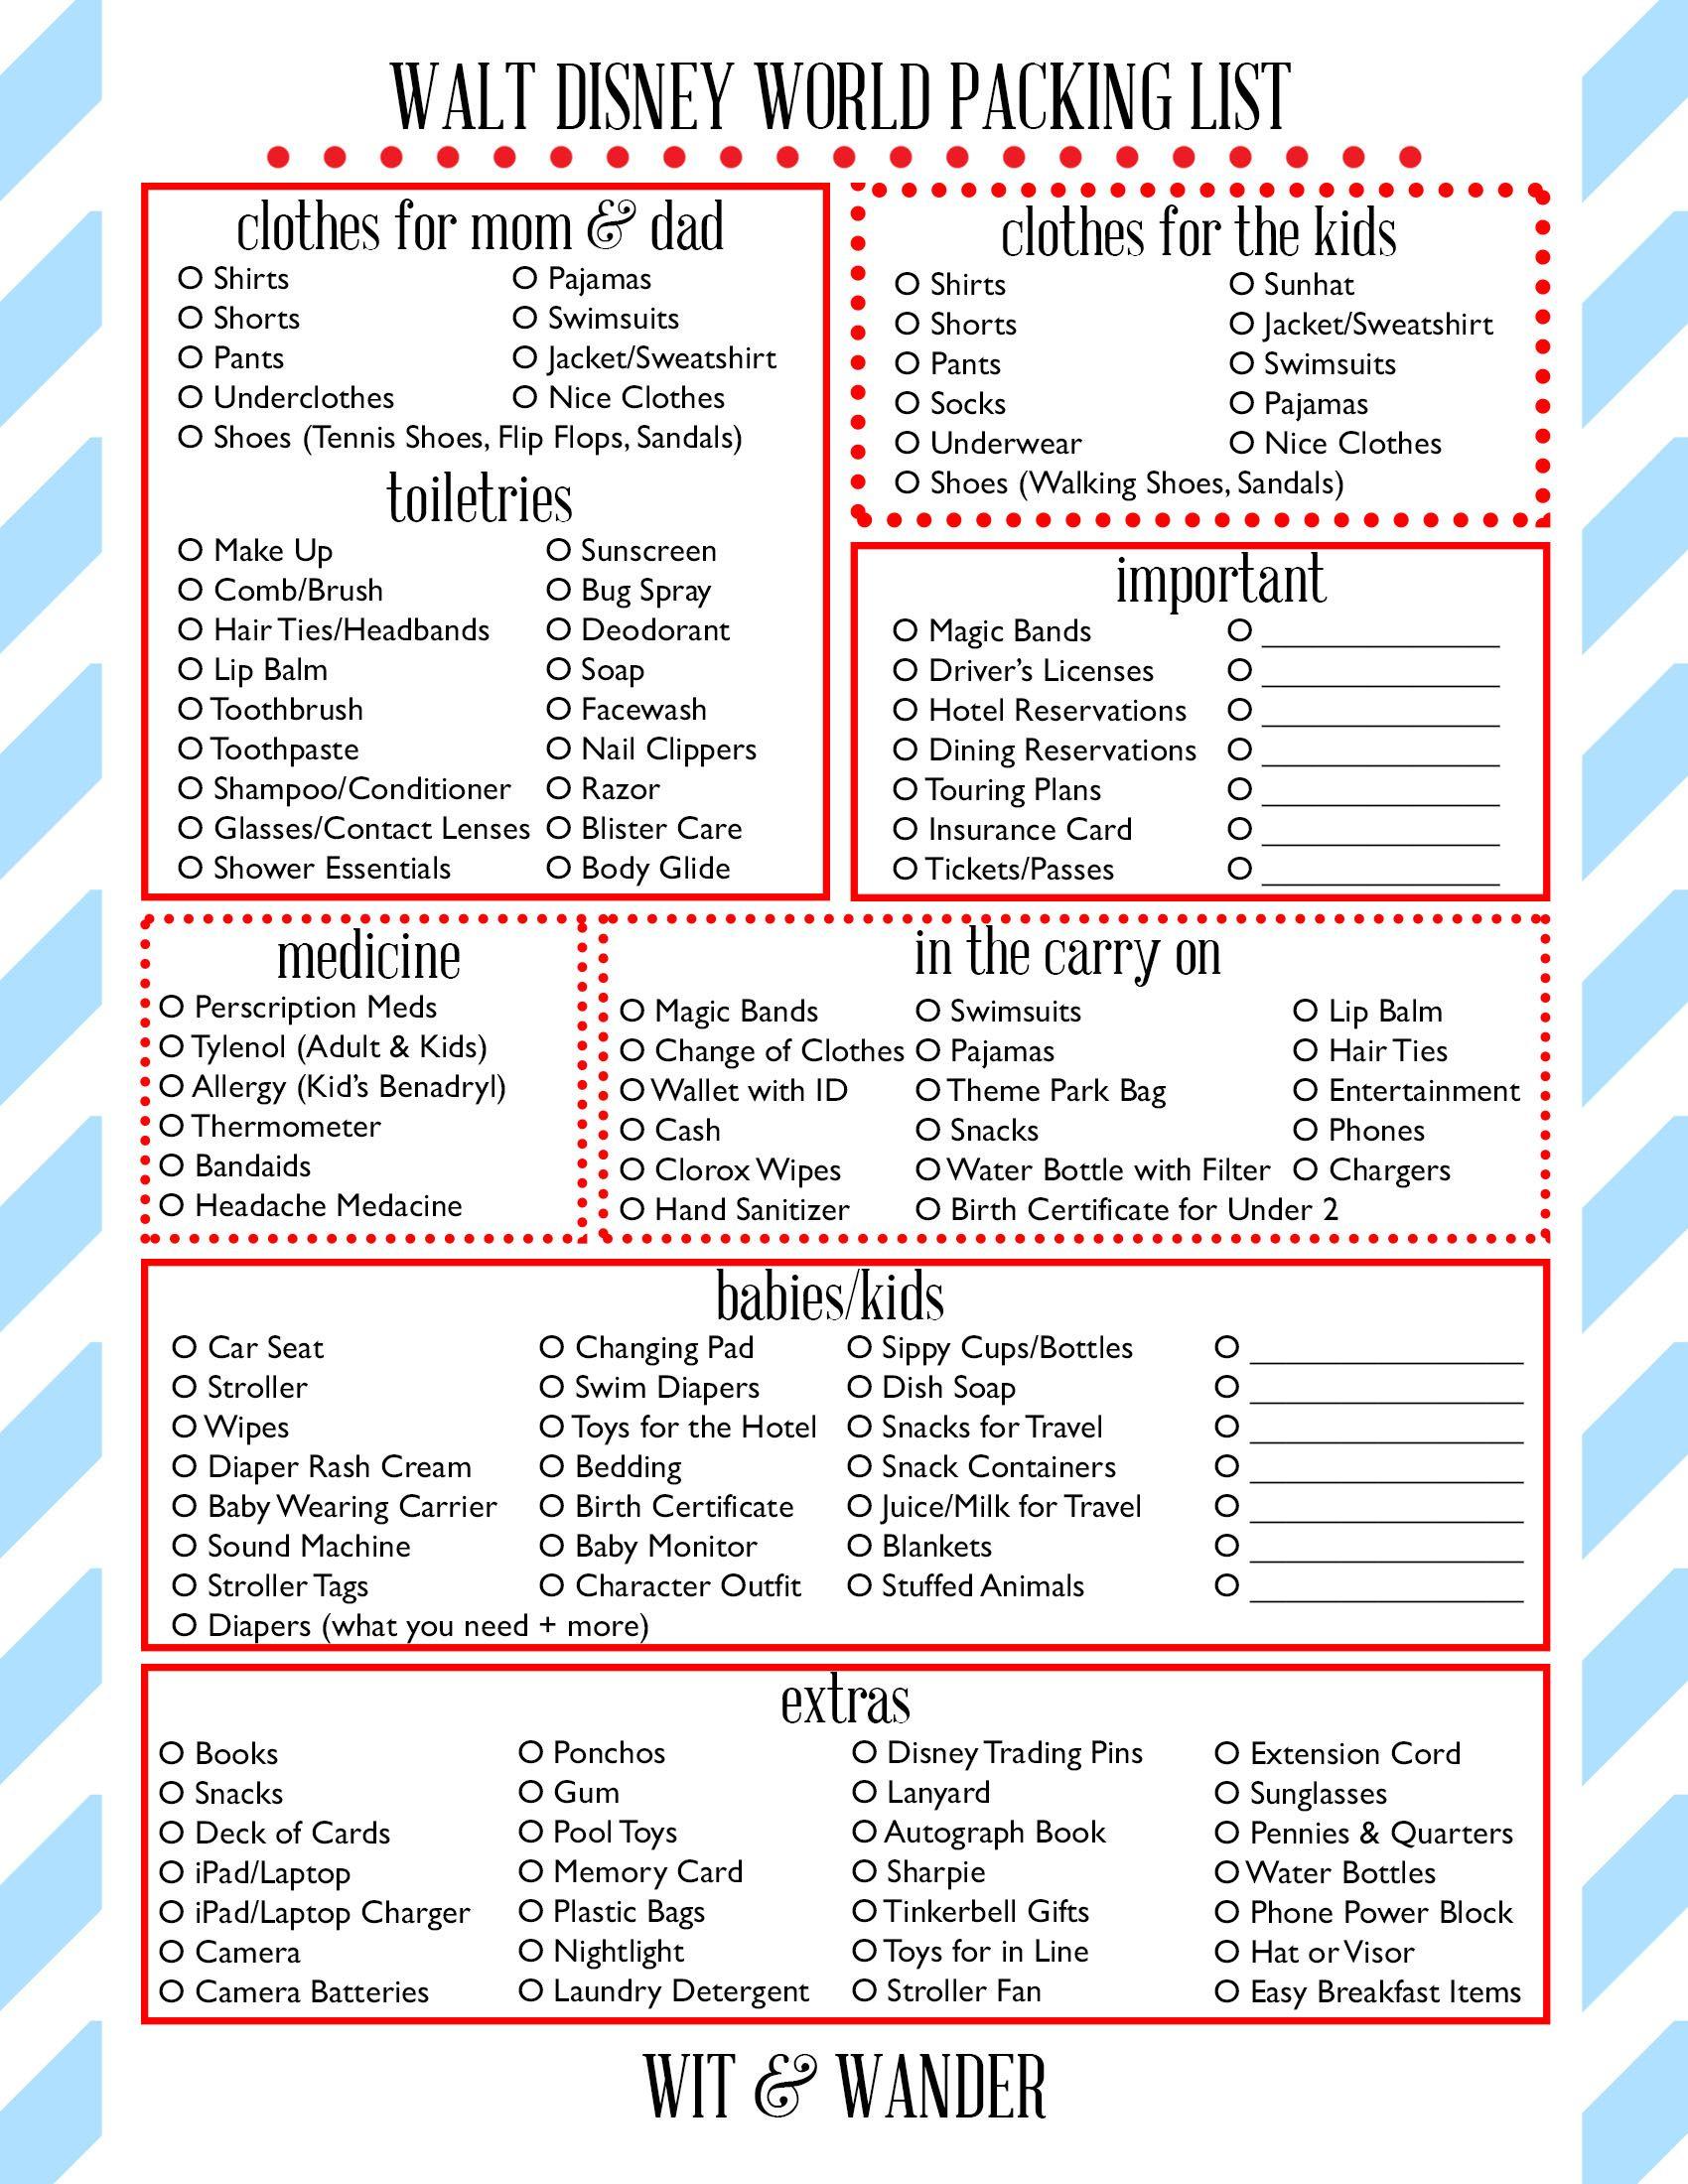 Walt Disney World Free Printables | Disney World Packing inside Printable List Of Rides At Disney World 2020 Checklist